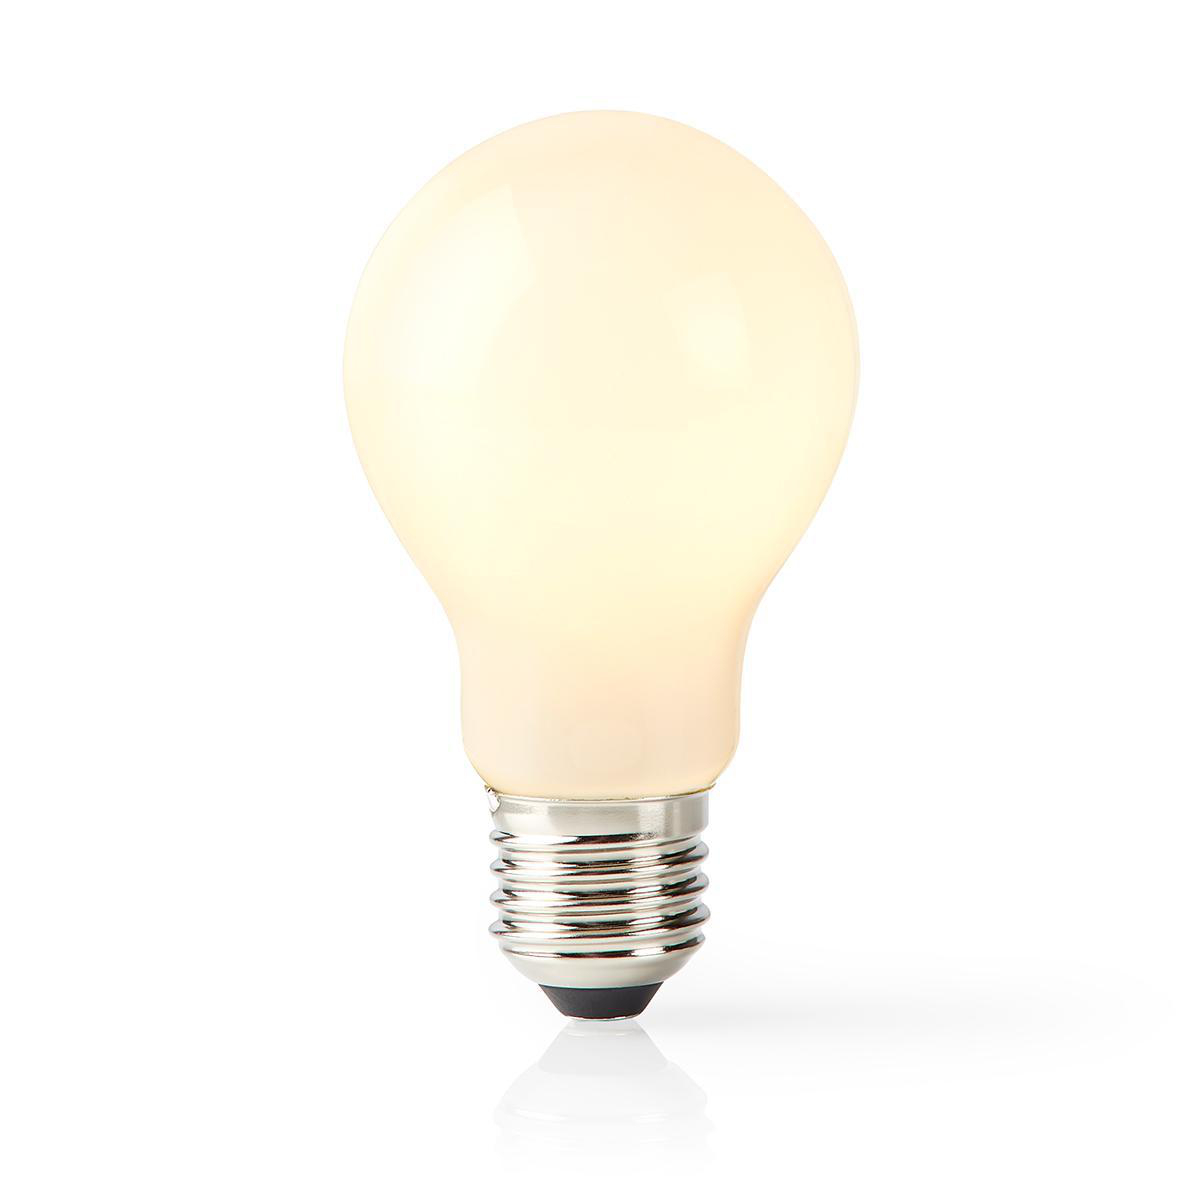 Slimme Led Lamp met wifi E27 fitting 2700K - warm wit - lamp aan